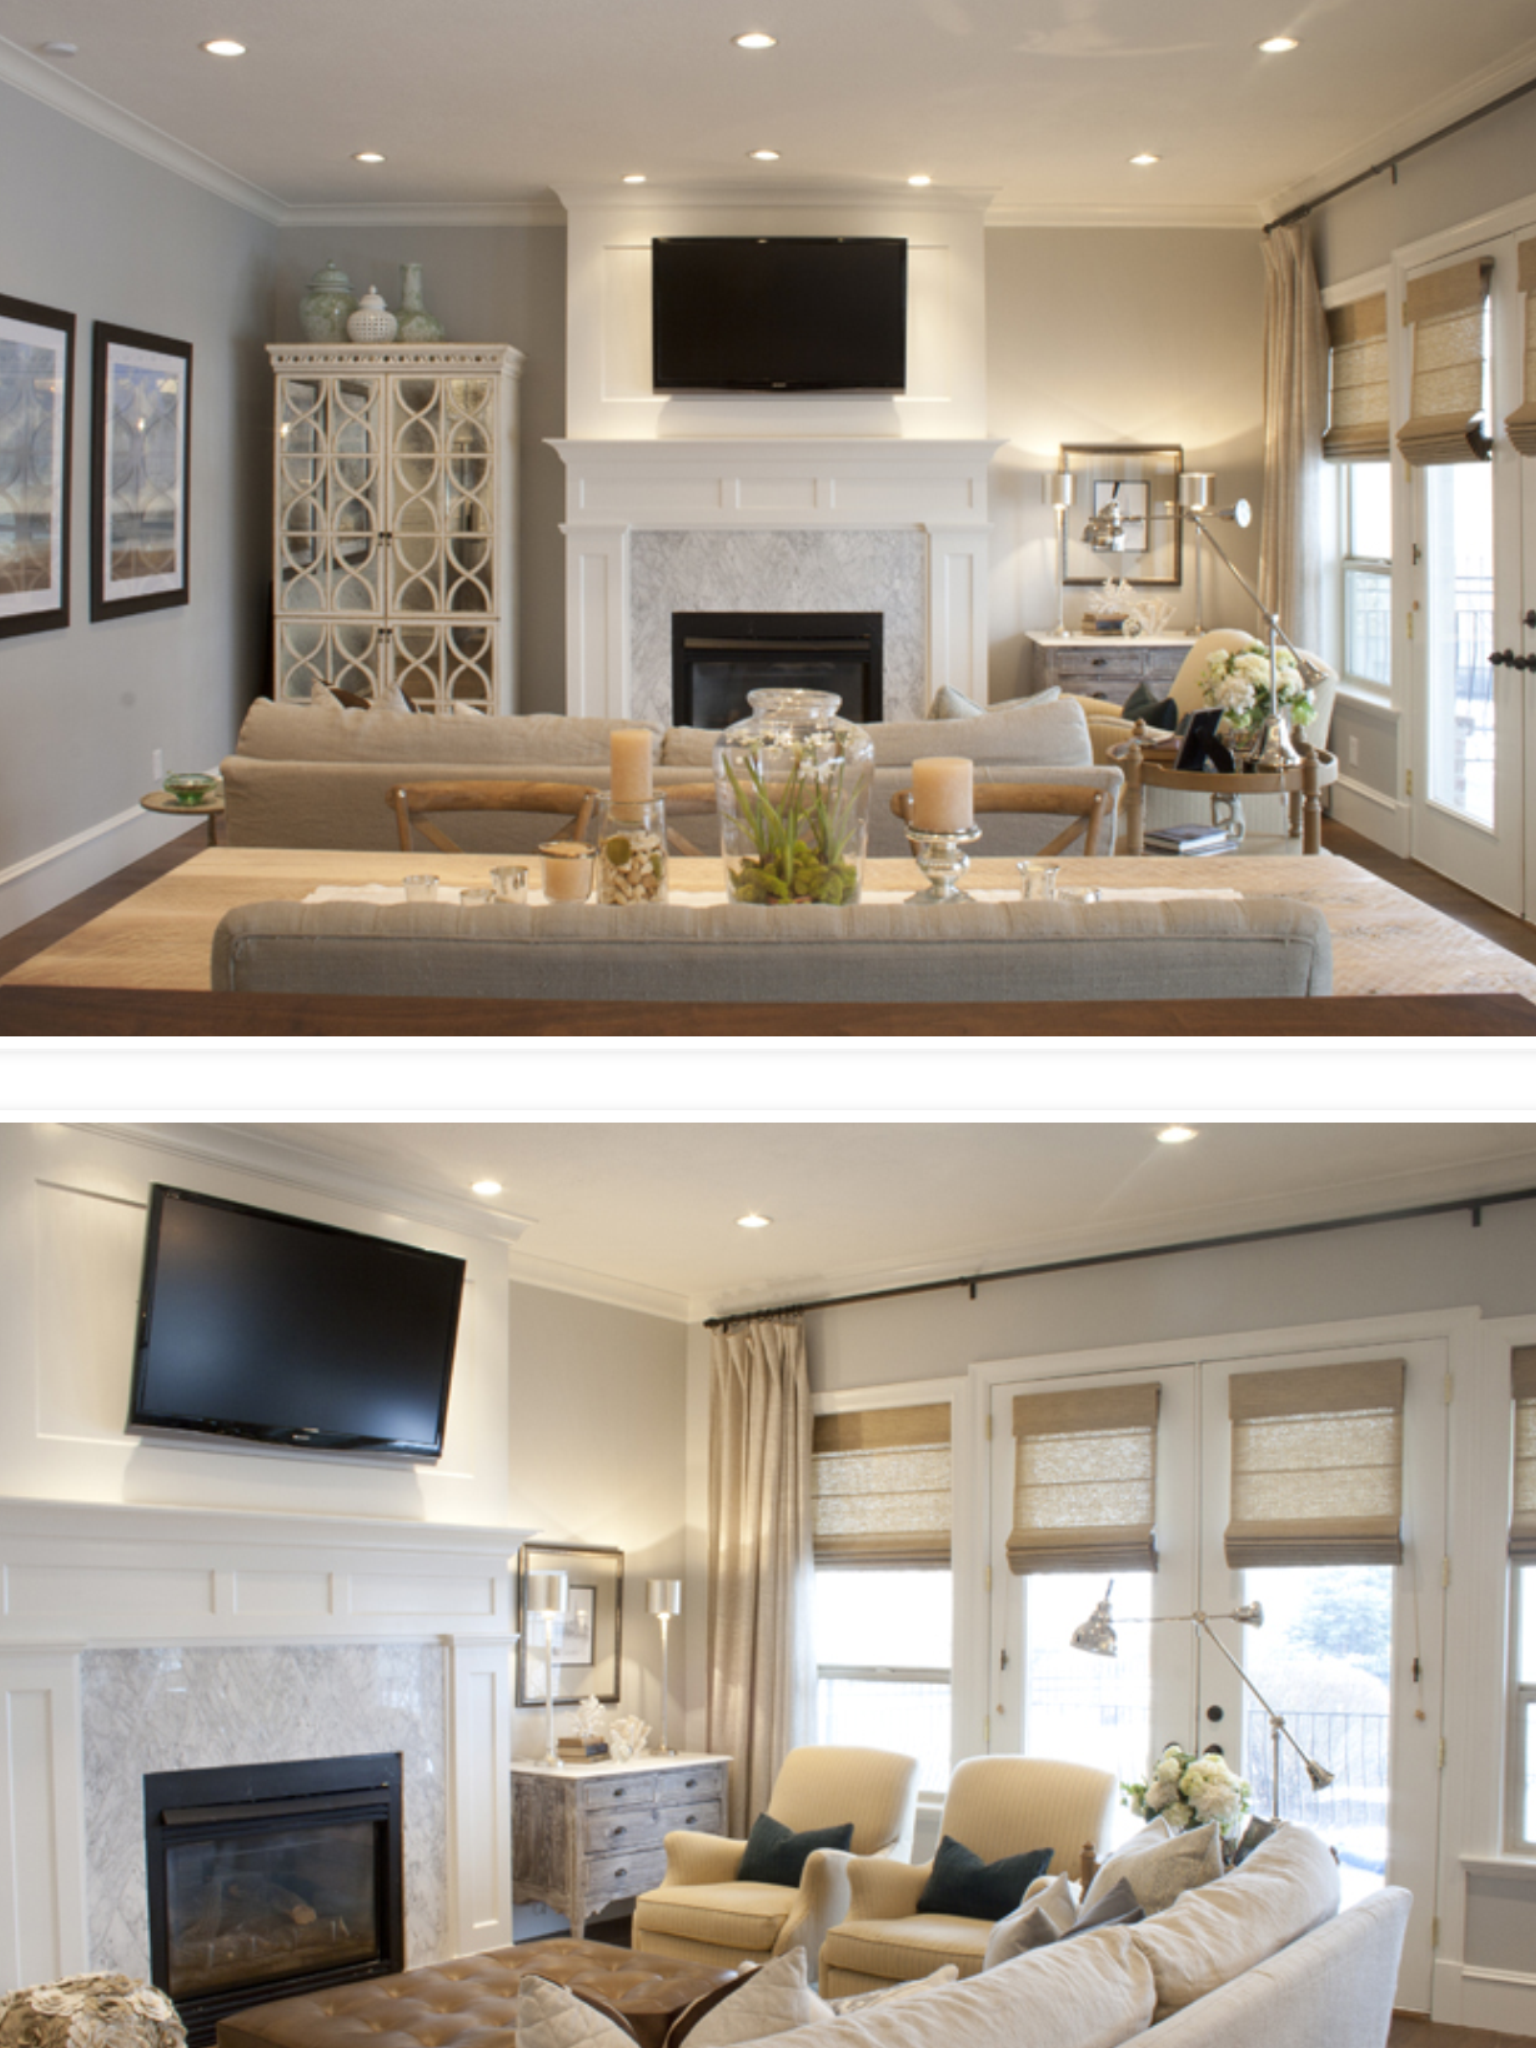 recessed lighting recessed lighting living room small on extraordinary living room ideas with lighting id=47930